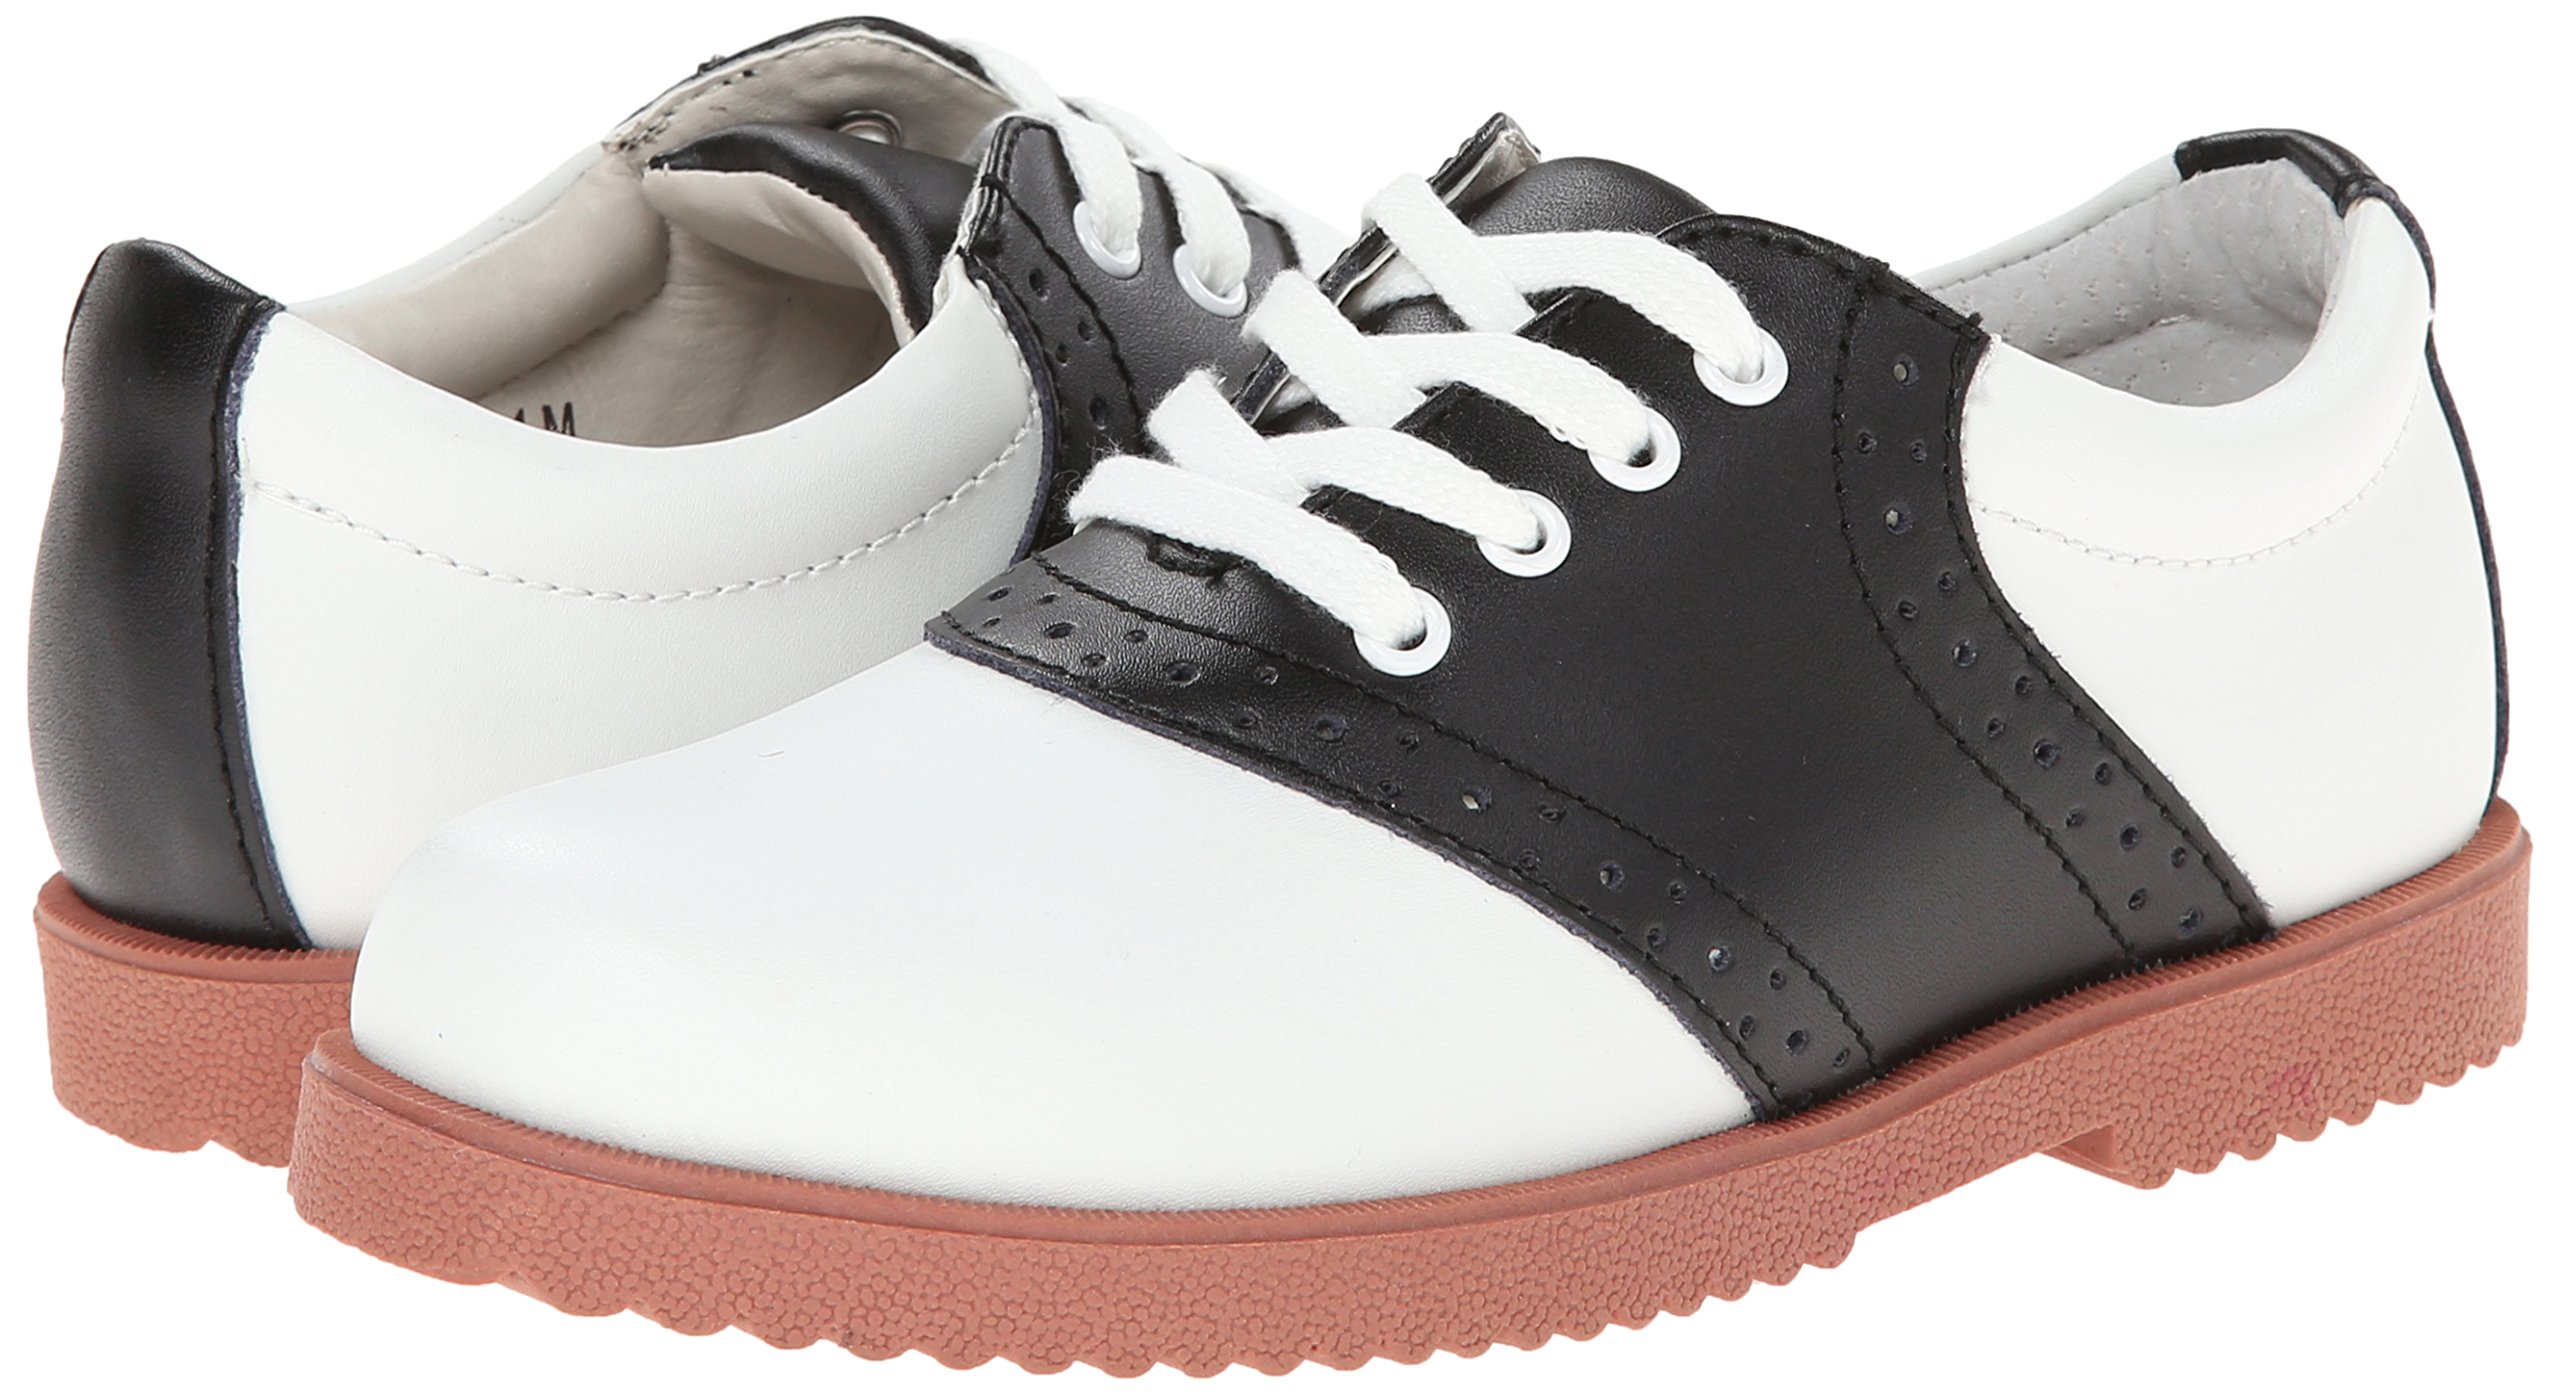 Academie Gear Honor Roll Saddle Shoe (Toddler/Little Kid/Big Kid),White/Black,4 W US Big Kid by Academie Gear (Image #6)